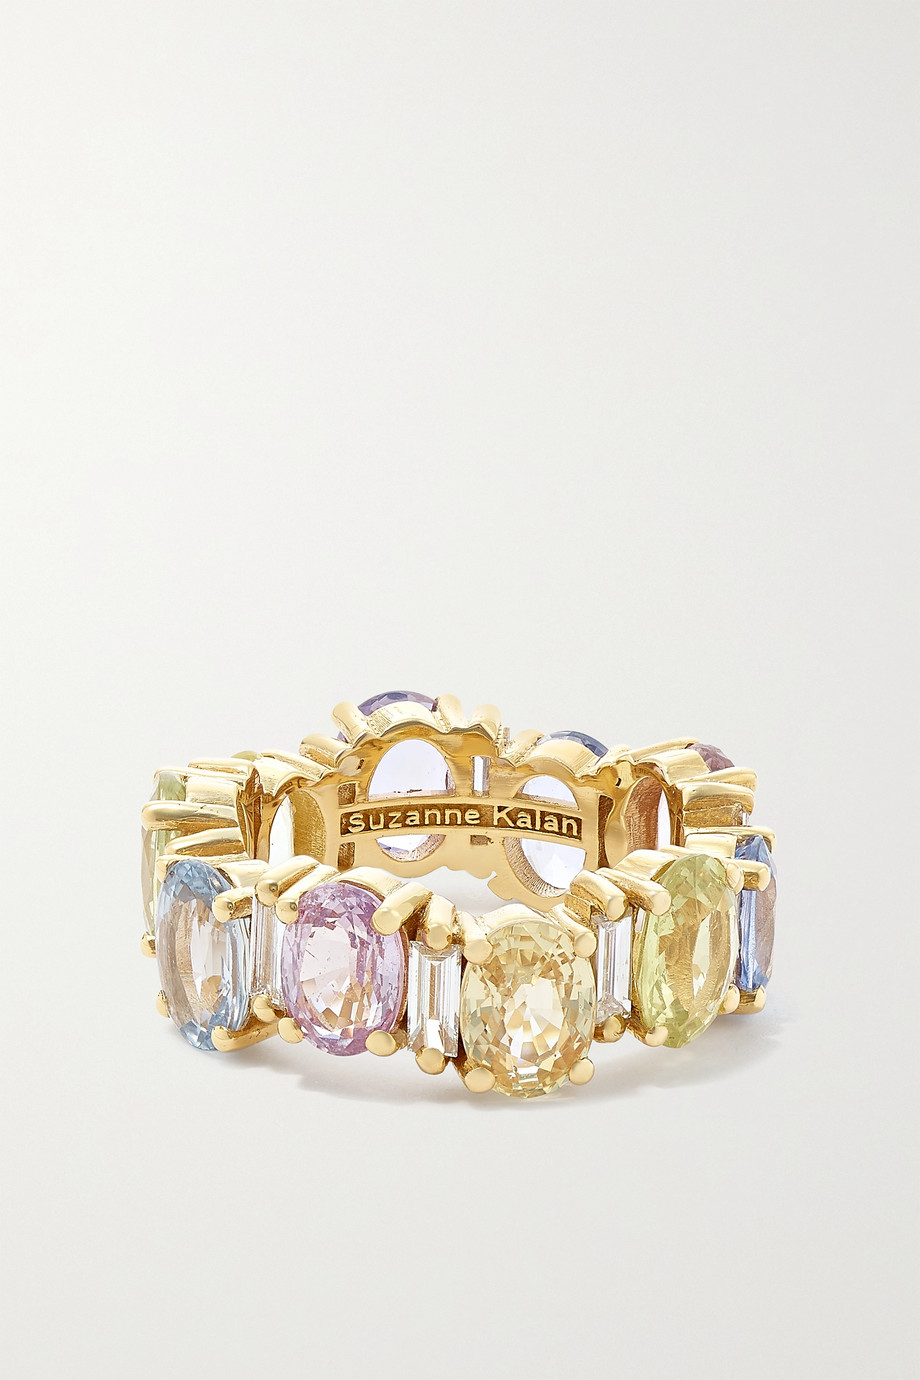 Suzanne Kalan Eternity 18-karat gold, sapphire and diamond ring